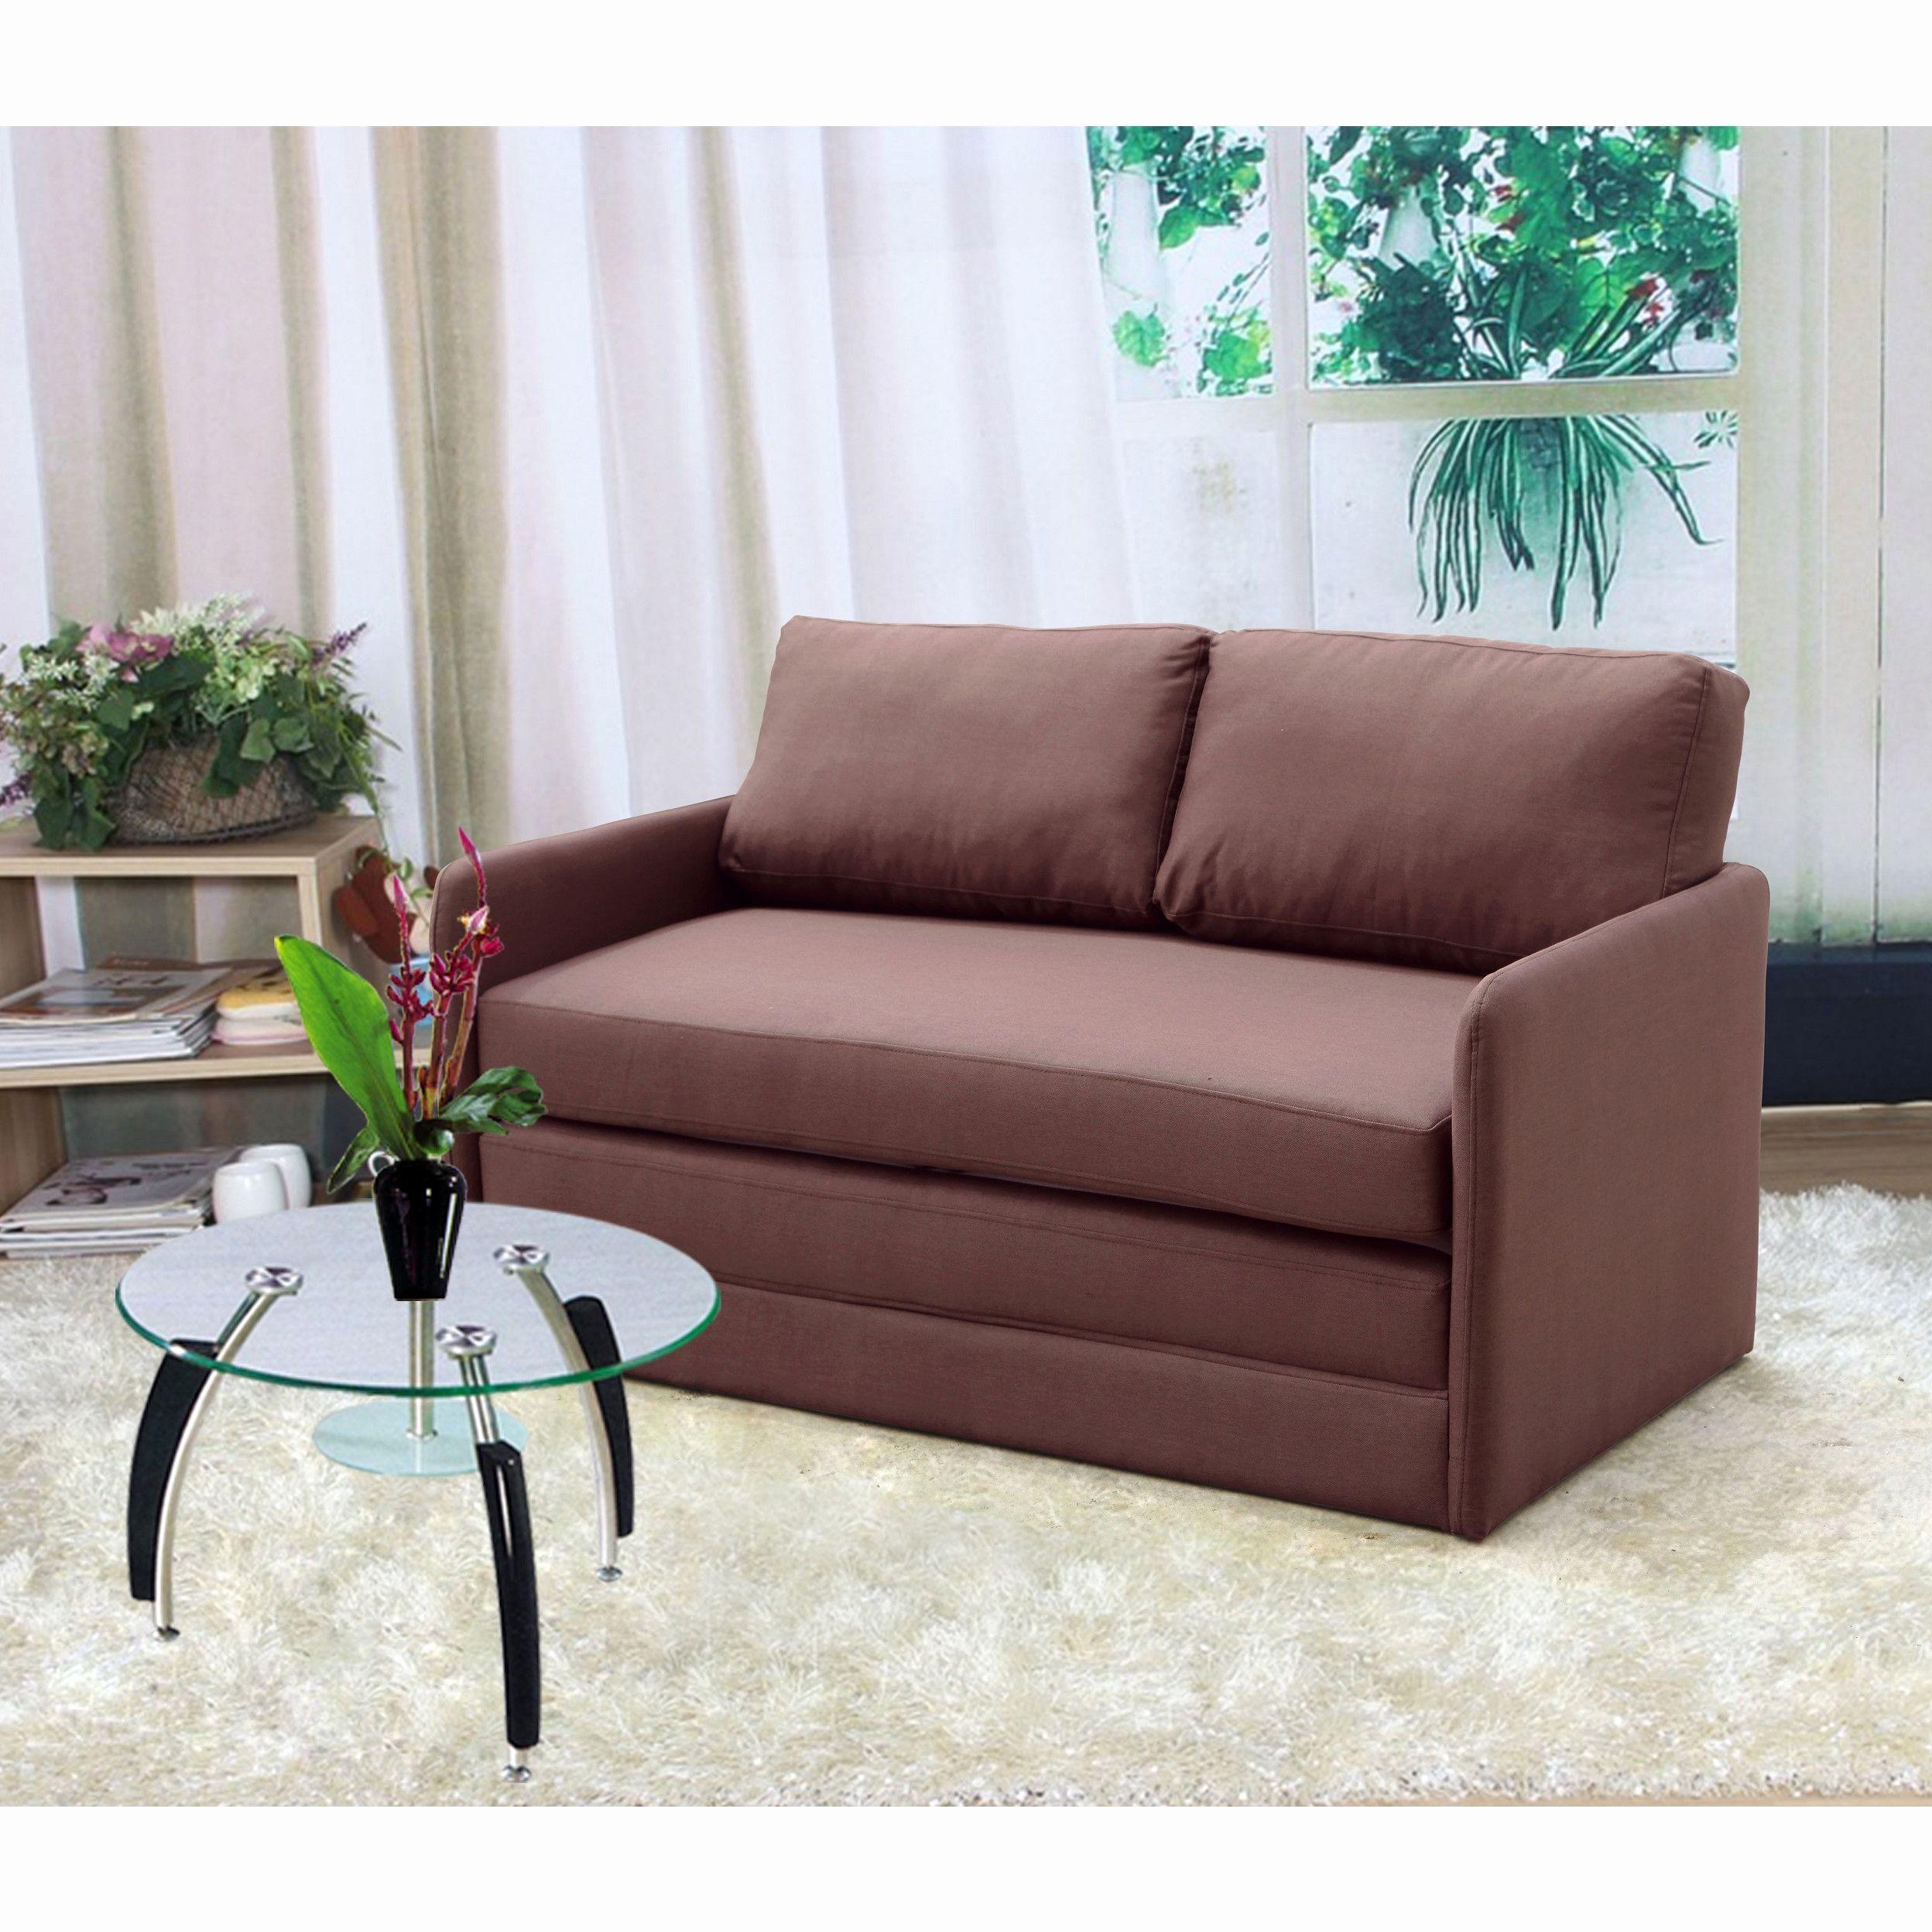 Beautiful Modern Futon sofa Bed s Modern Futon sofa Bed Fresh